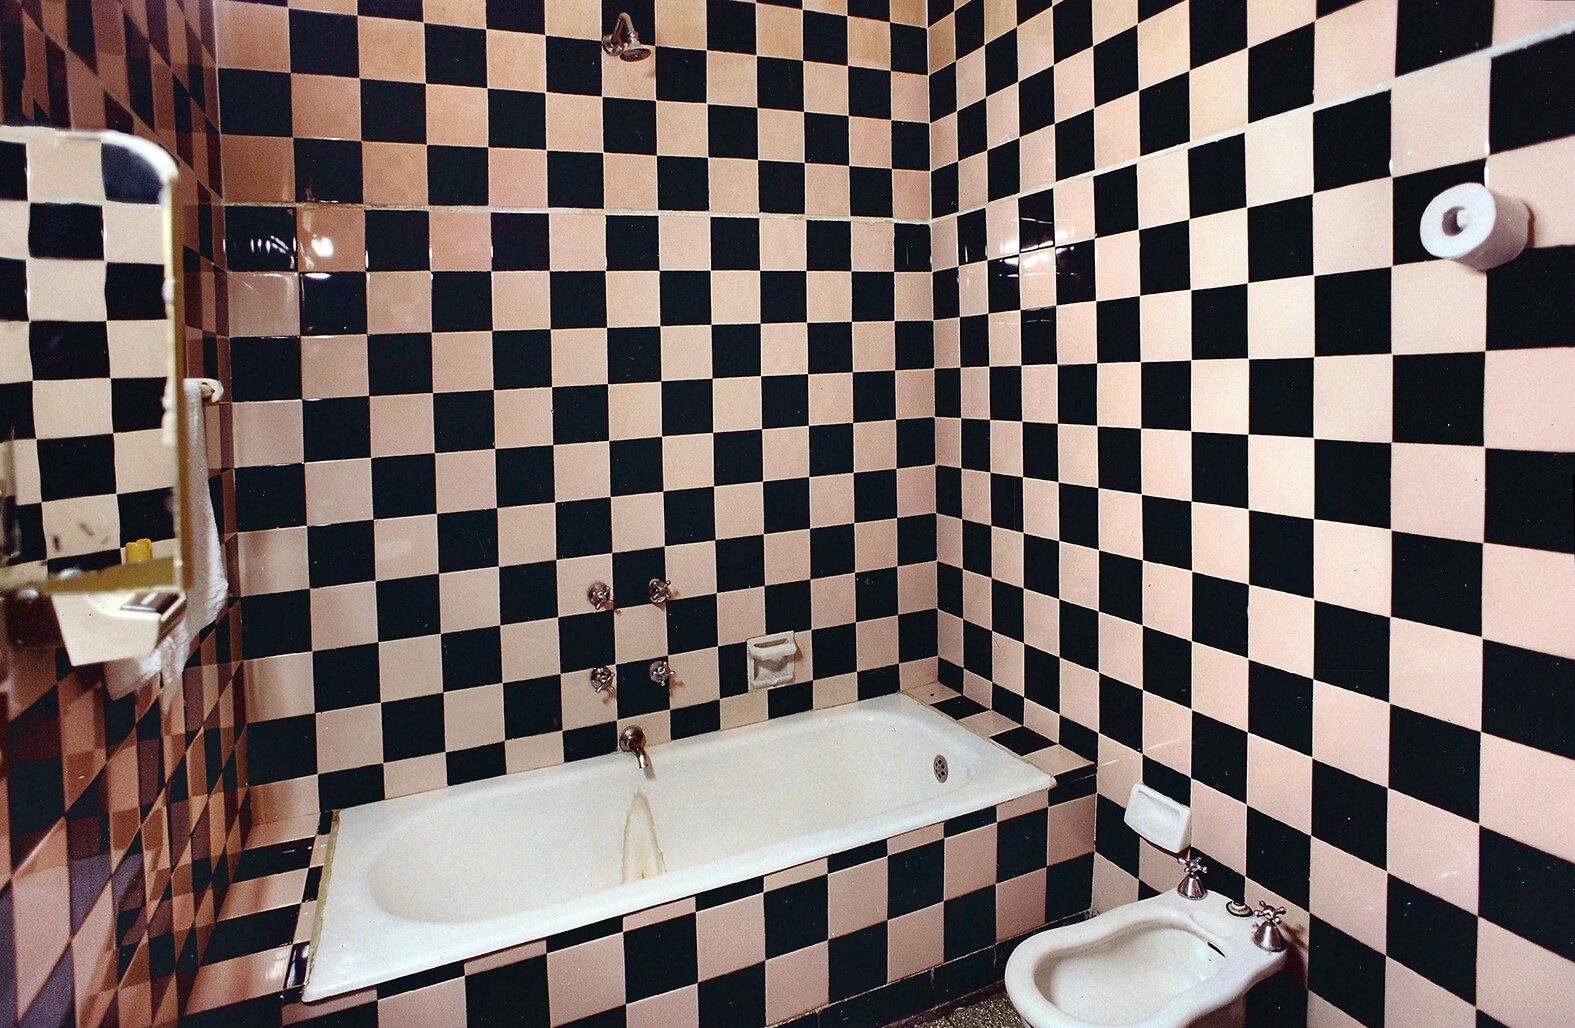 05 Baño cuadriculado-Checked bathroom 2000 copia.jpg